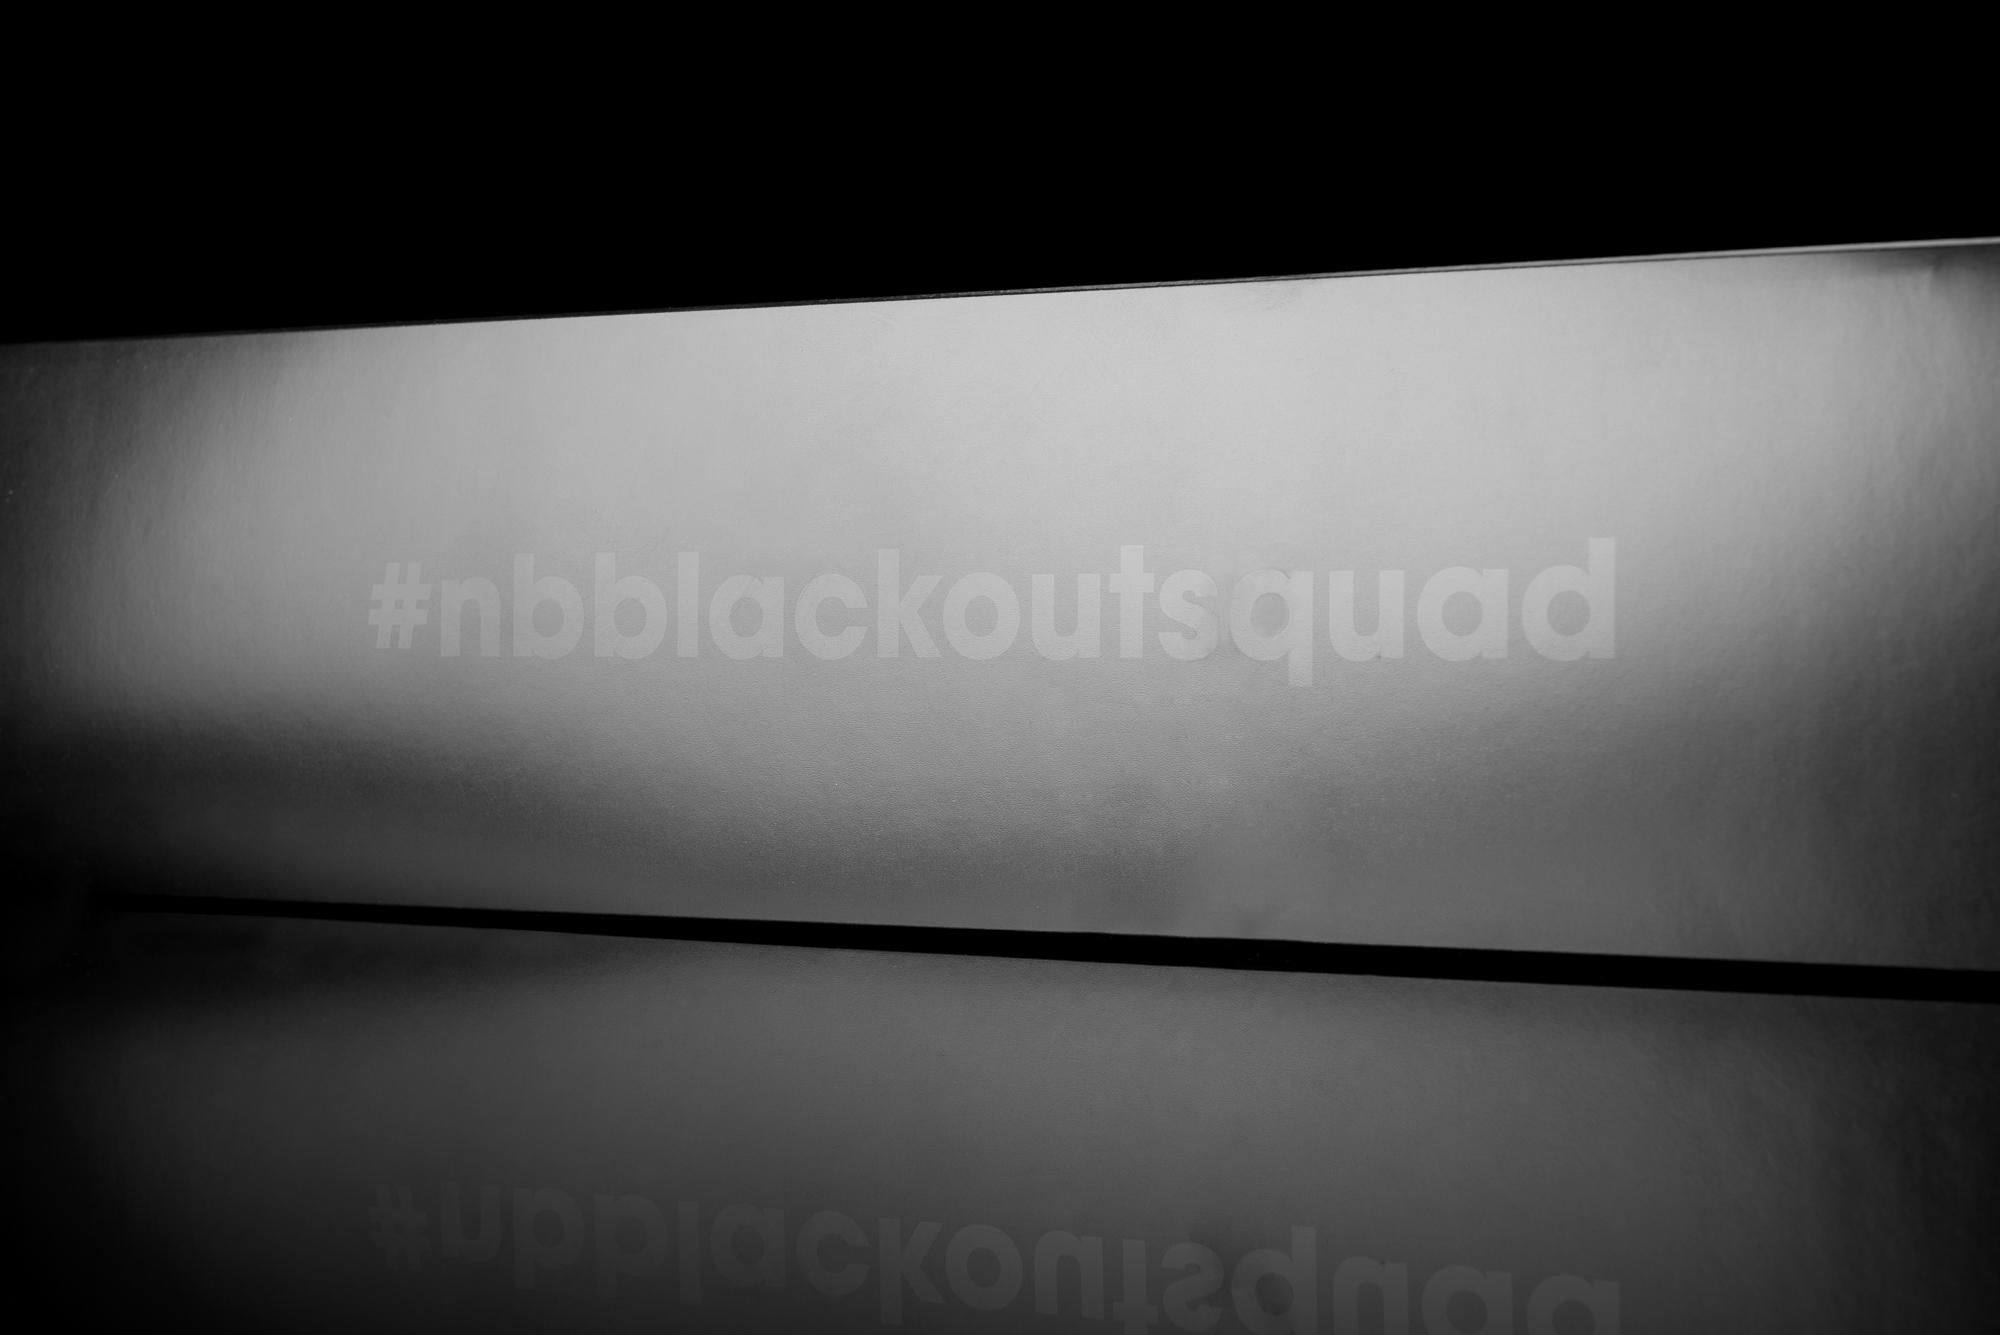 BlackOutSquadBox03-2.jpg